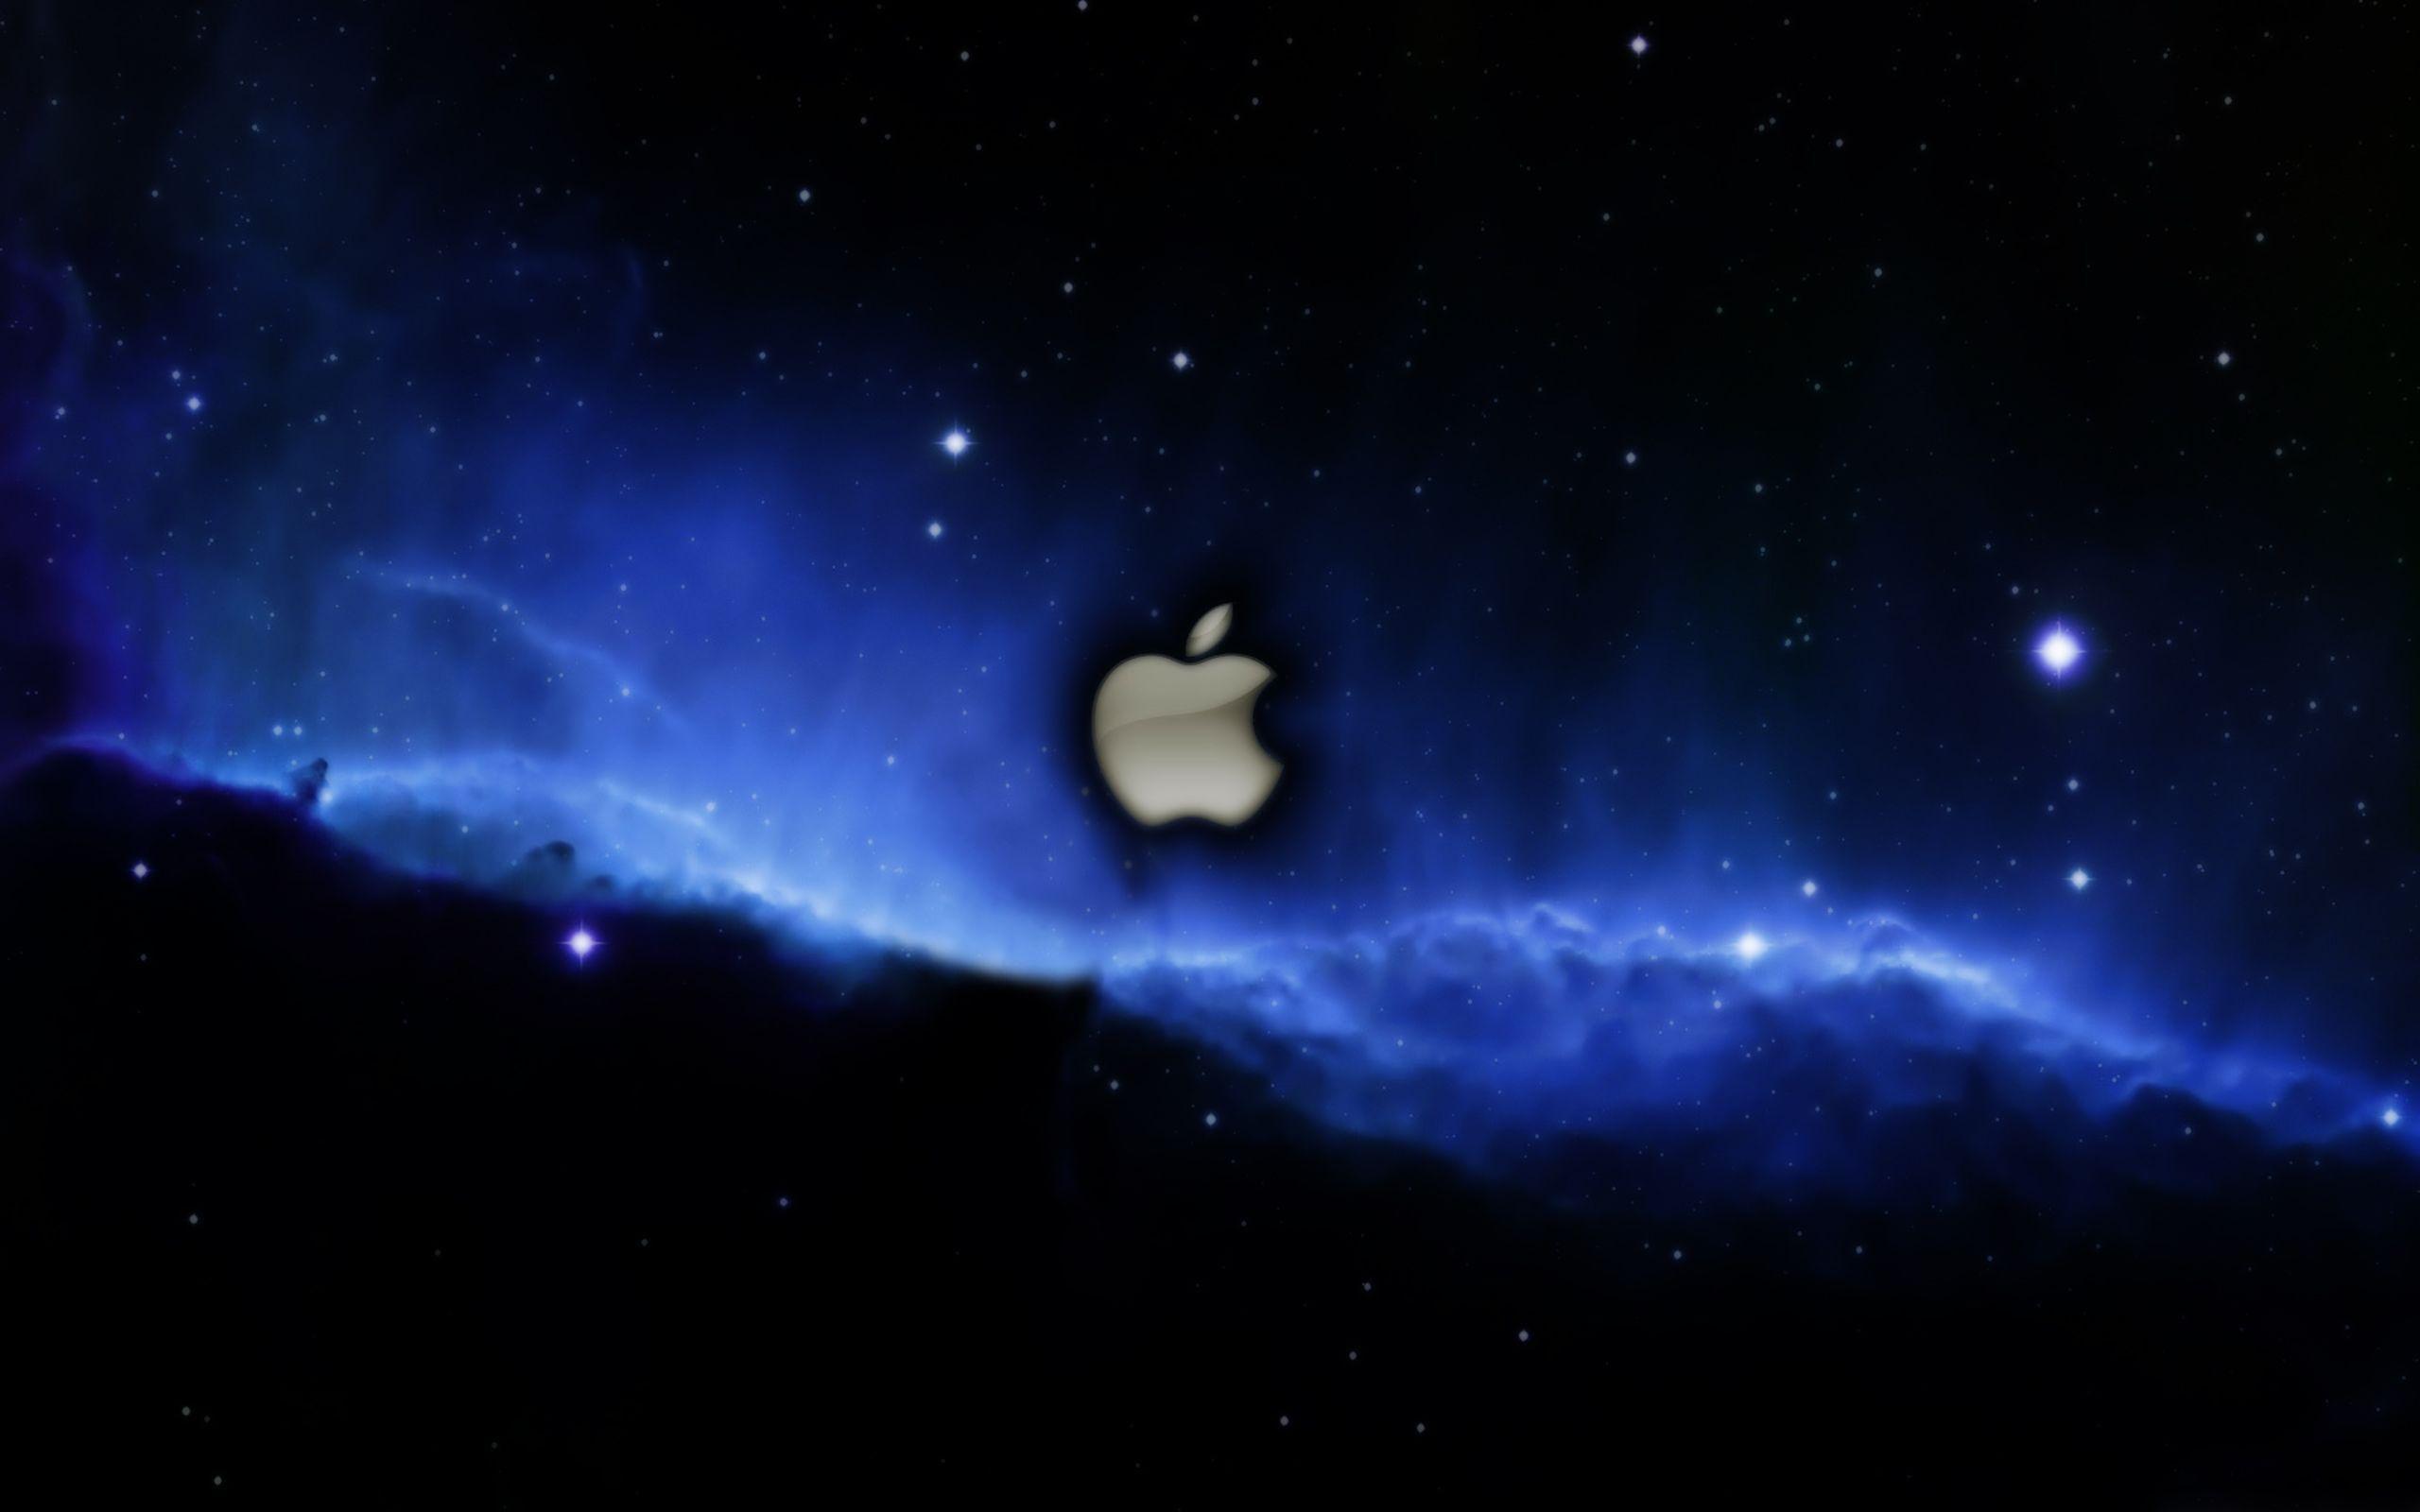 Apple 3D Wallpapers  Wallpaper Cave